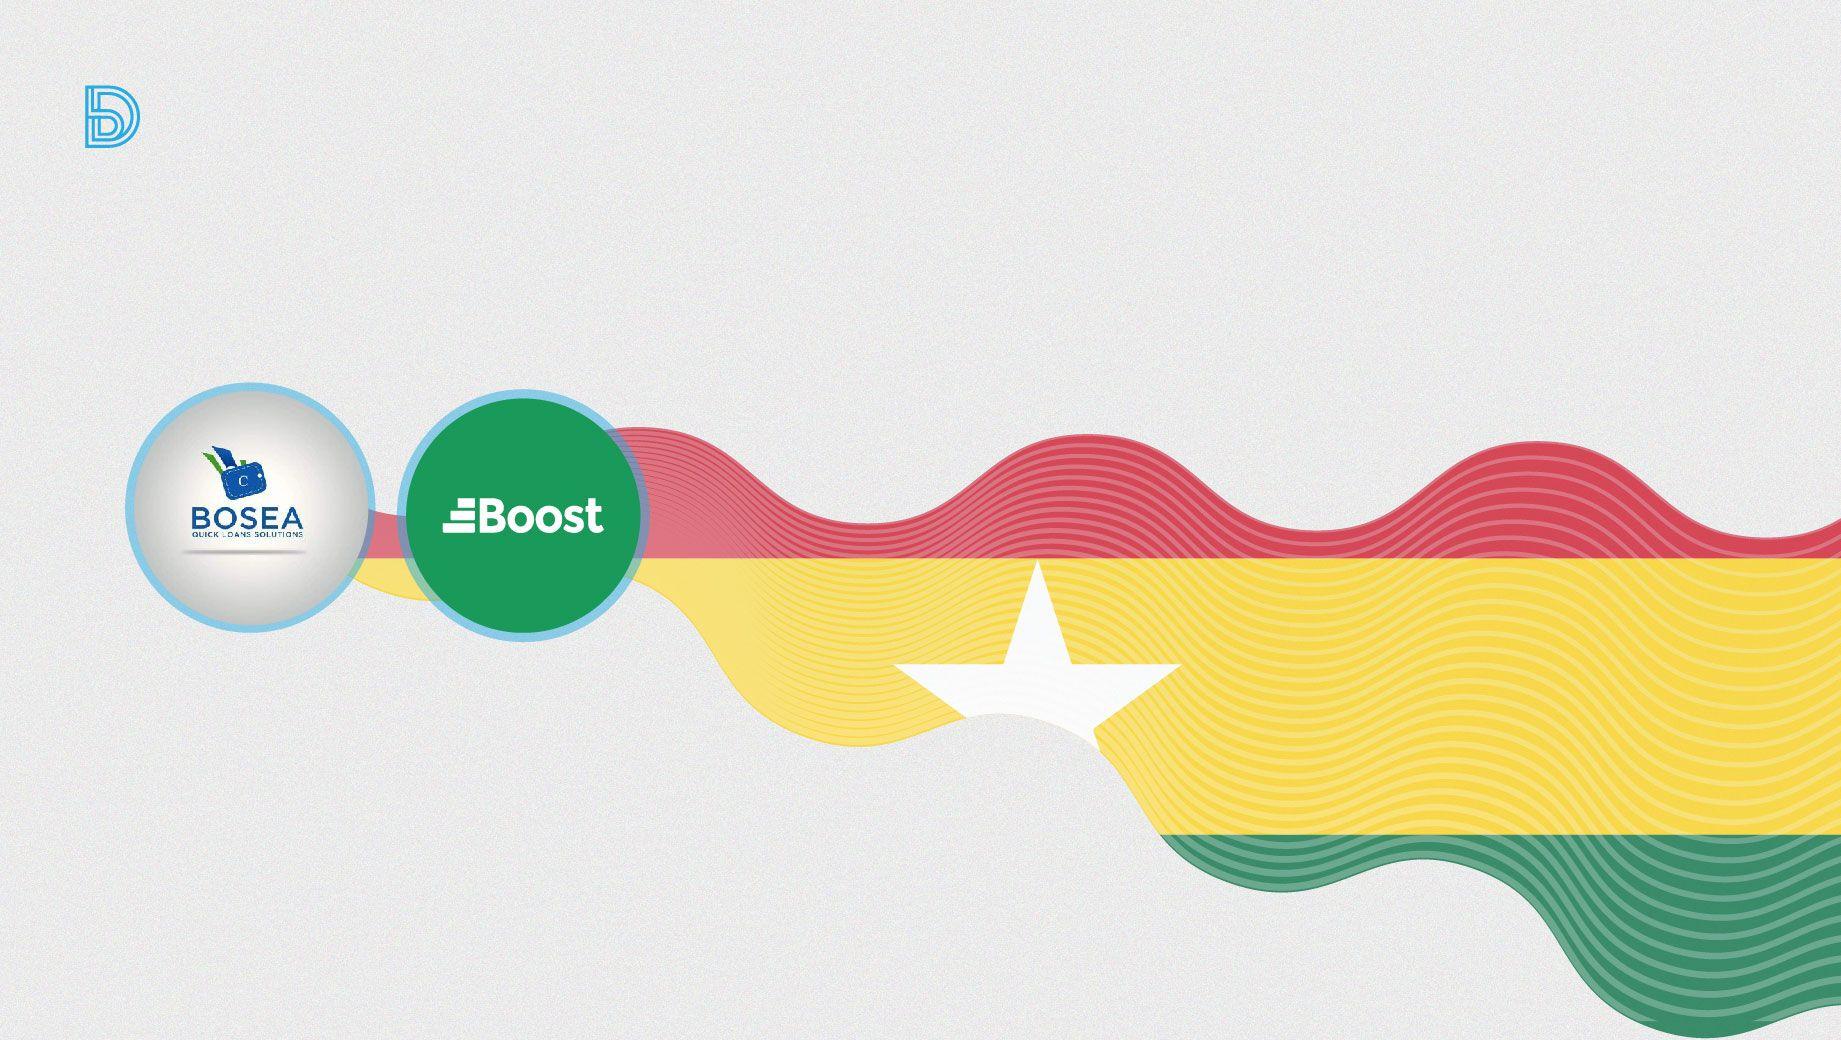 Promising Ghanaian startups-Bosea & Boost making waves.